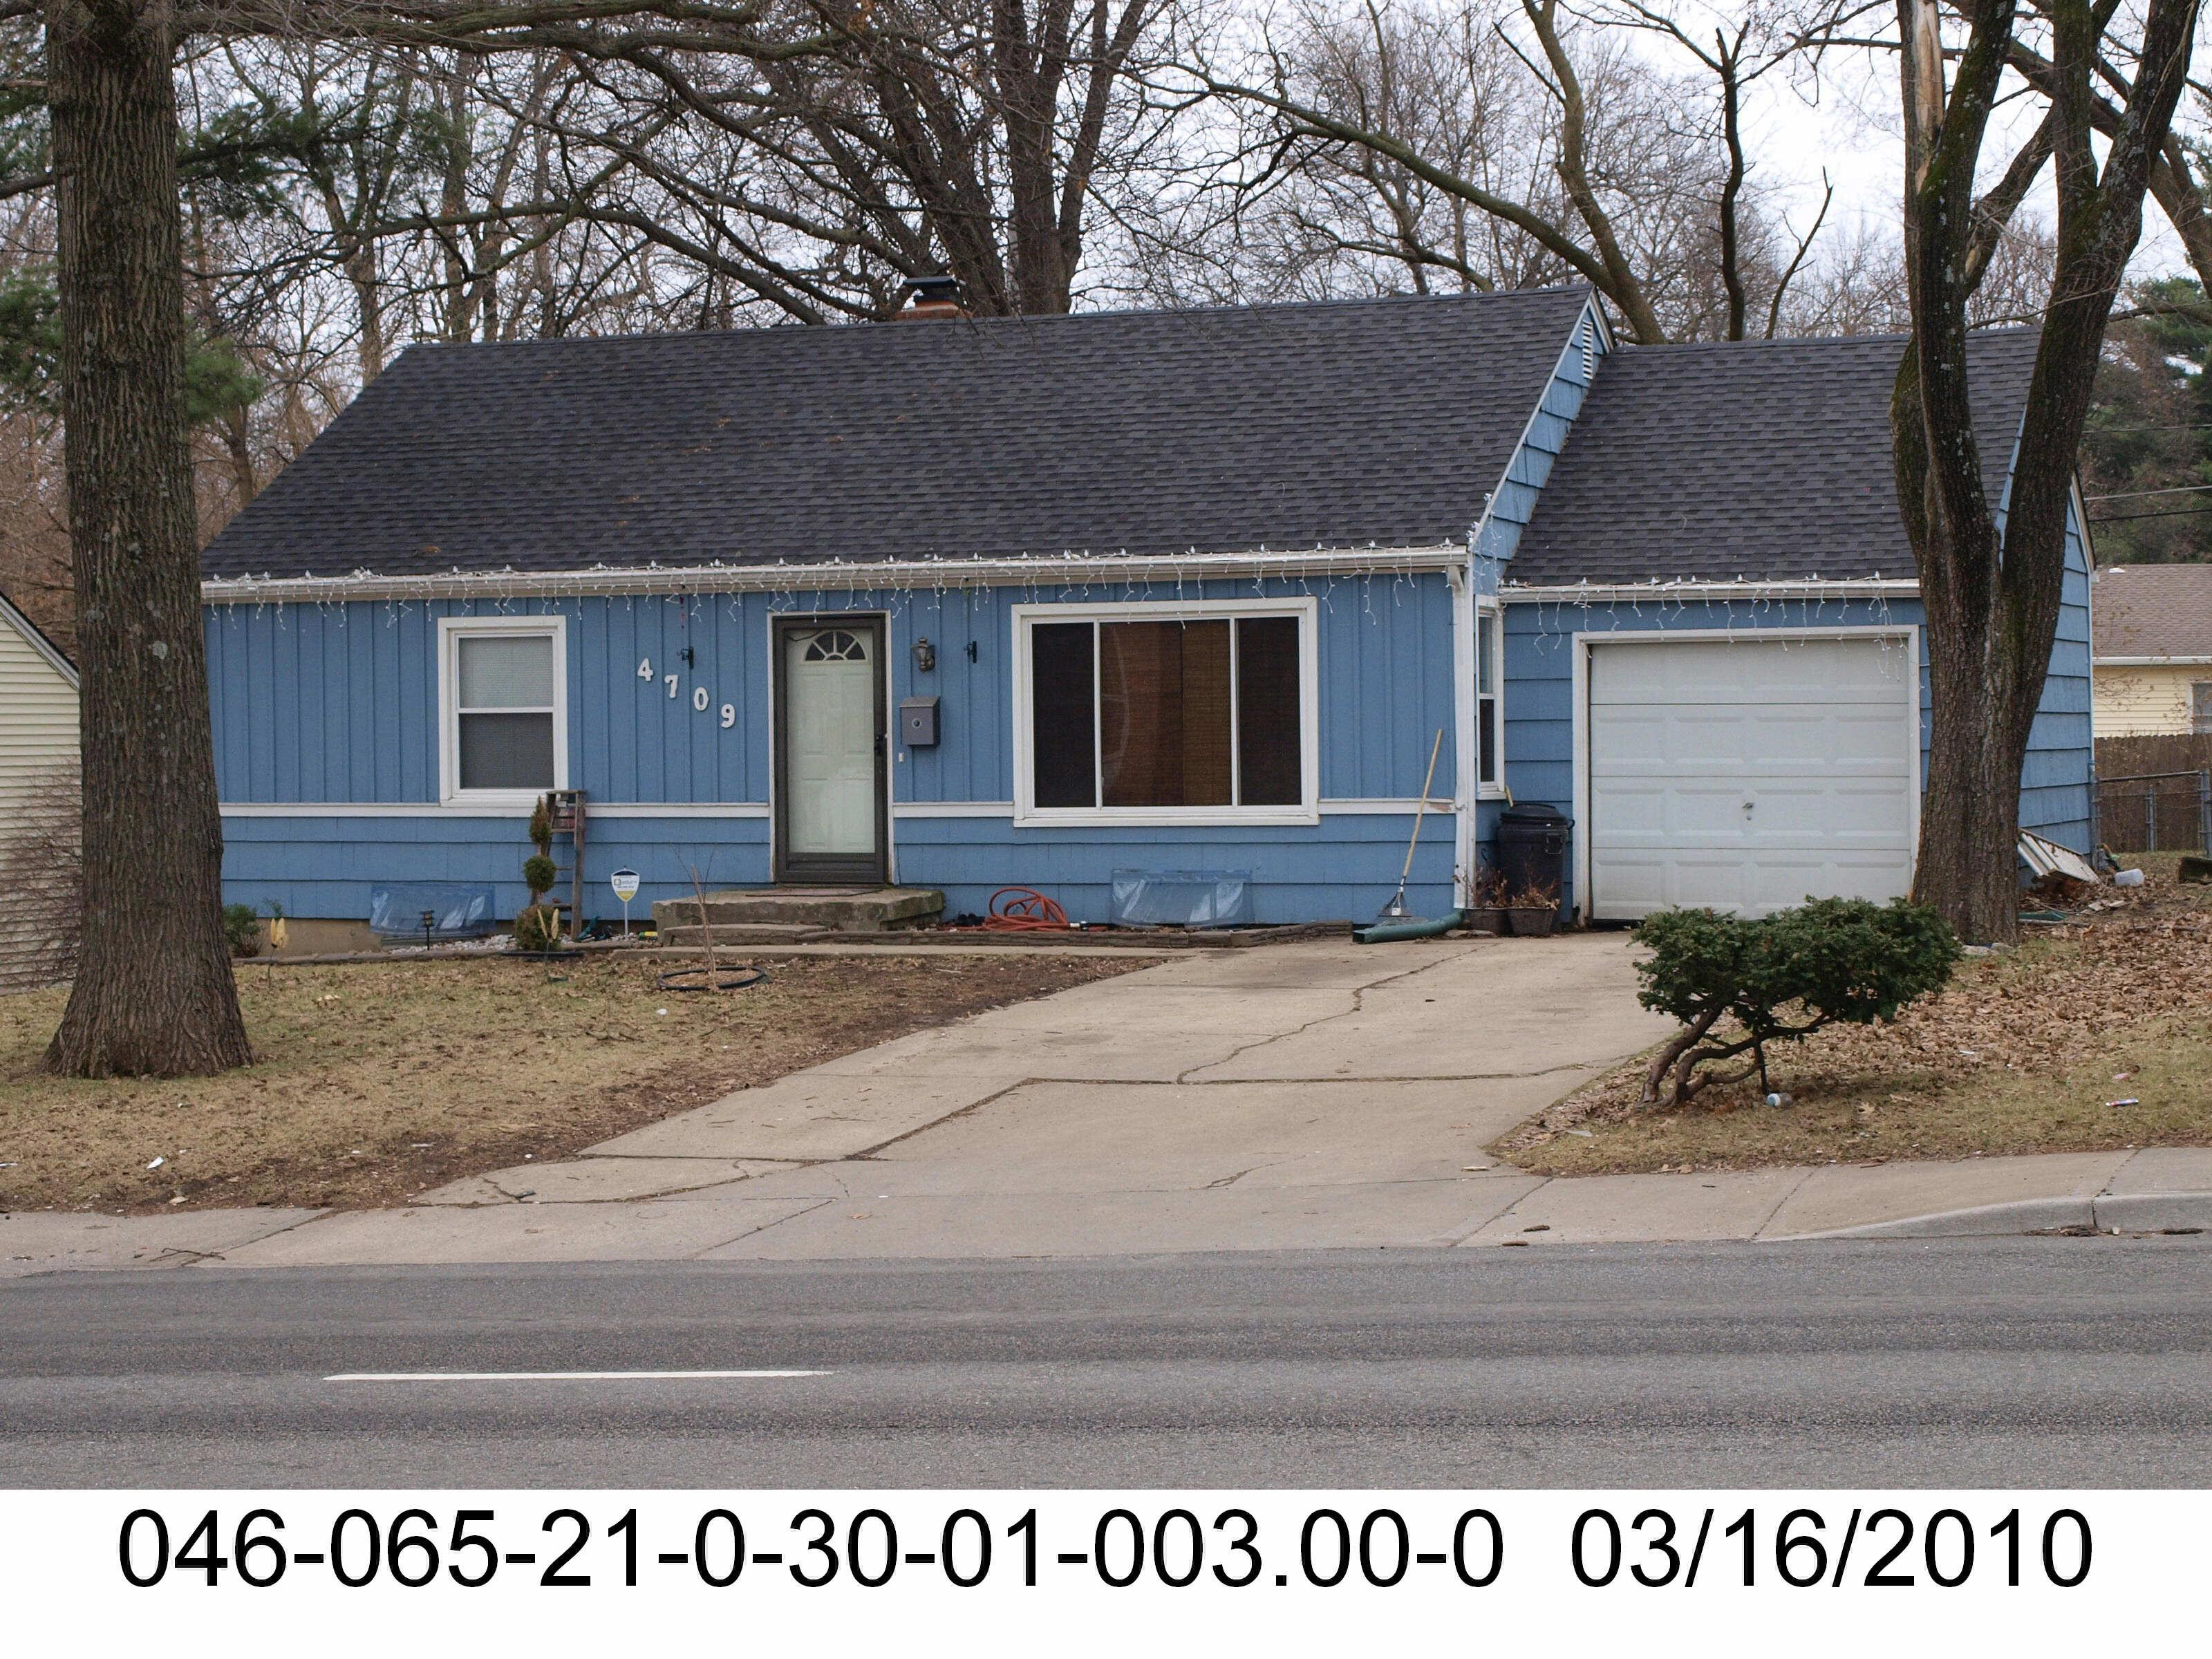 Kansas johnson county prairie village -  113 721 Property In Prairie Village Kansas